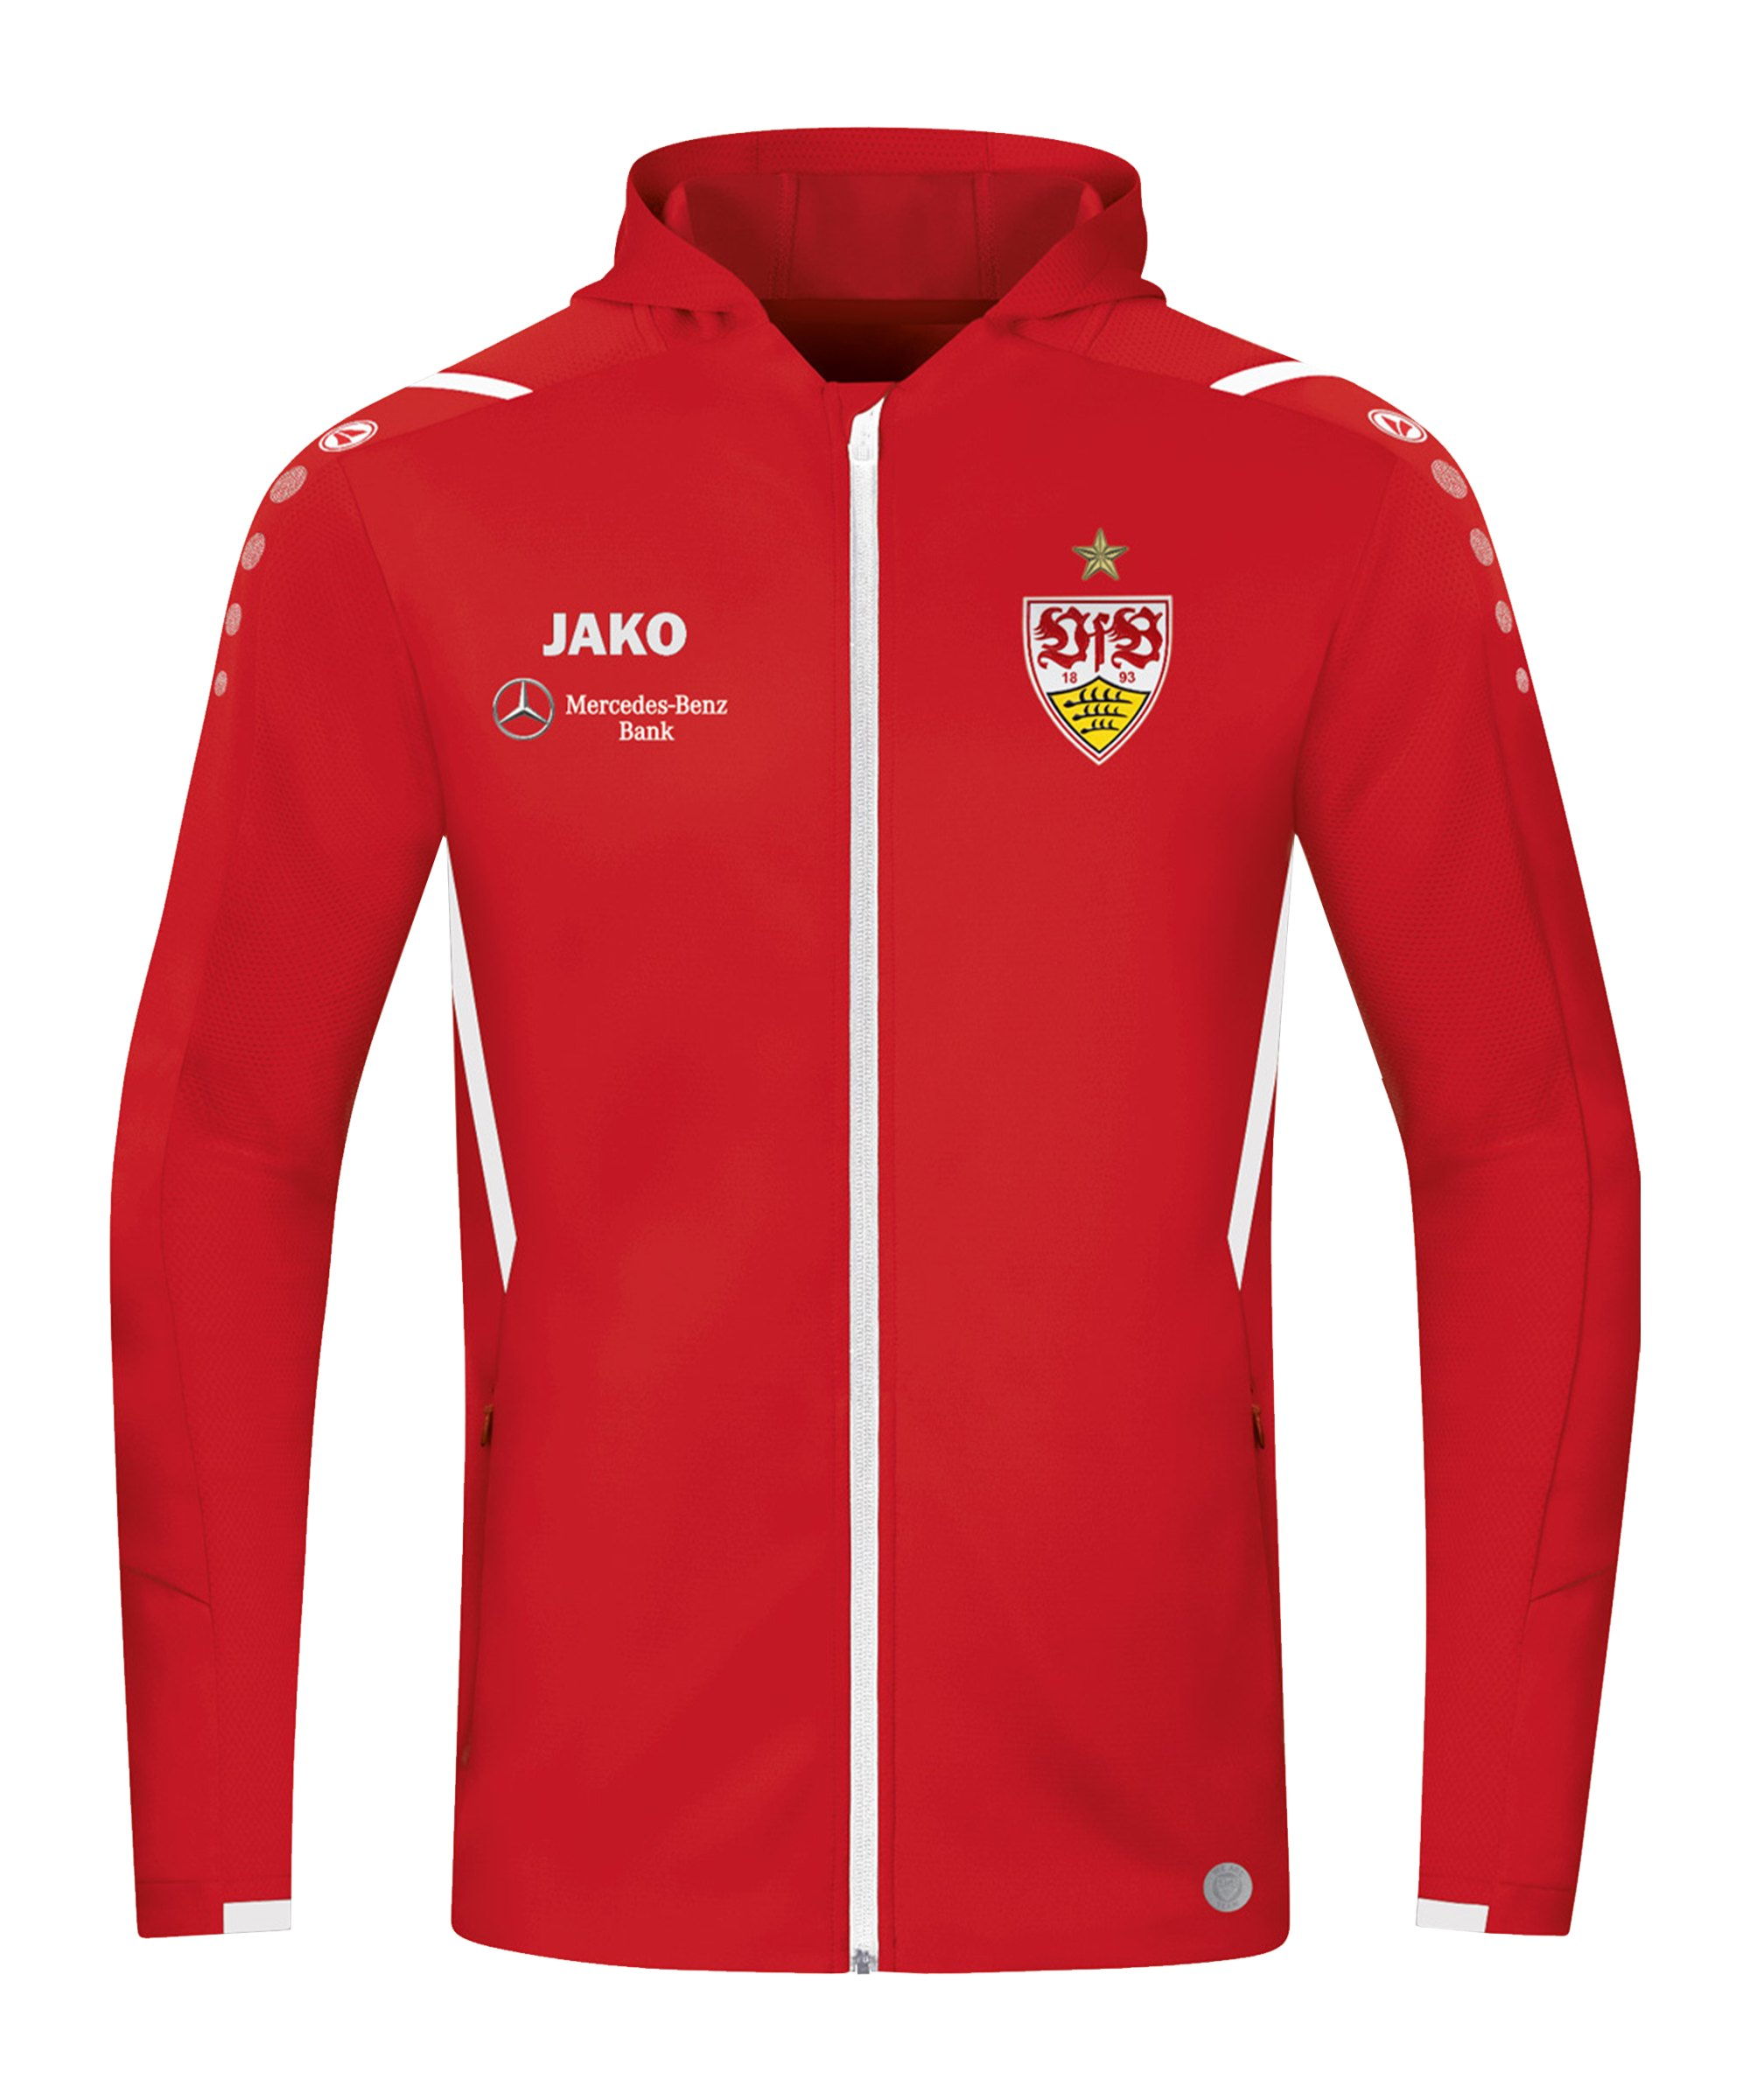 JAKO VfB Stuttgart Challenge Trainingsjacke Rot Weiss F102 - rot